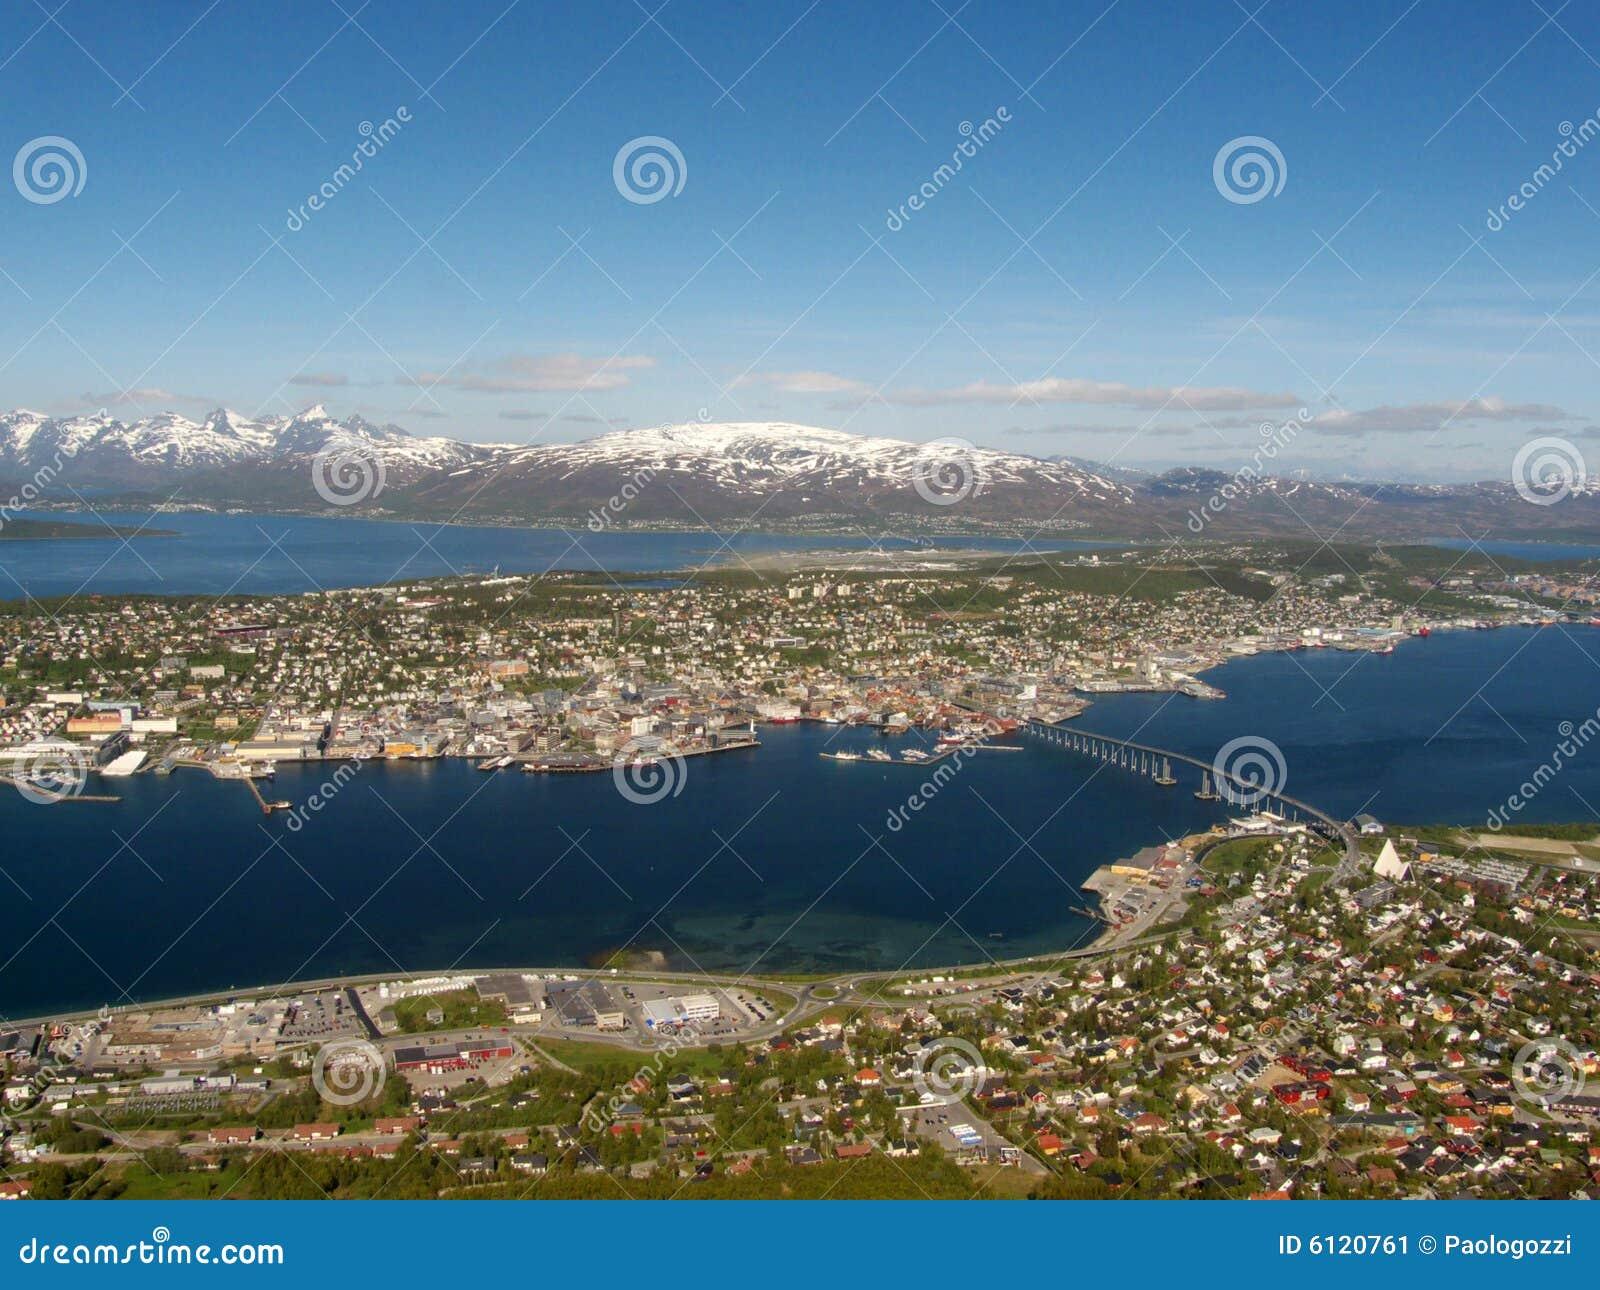 The central part of Tromsoe